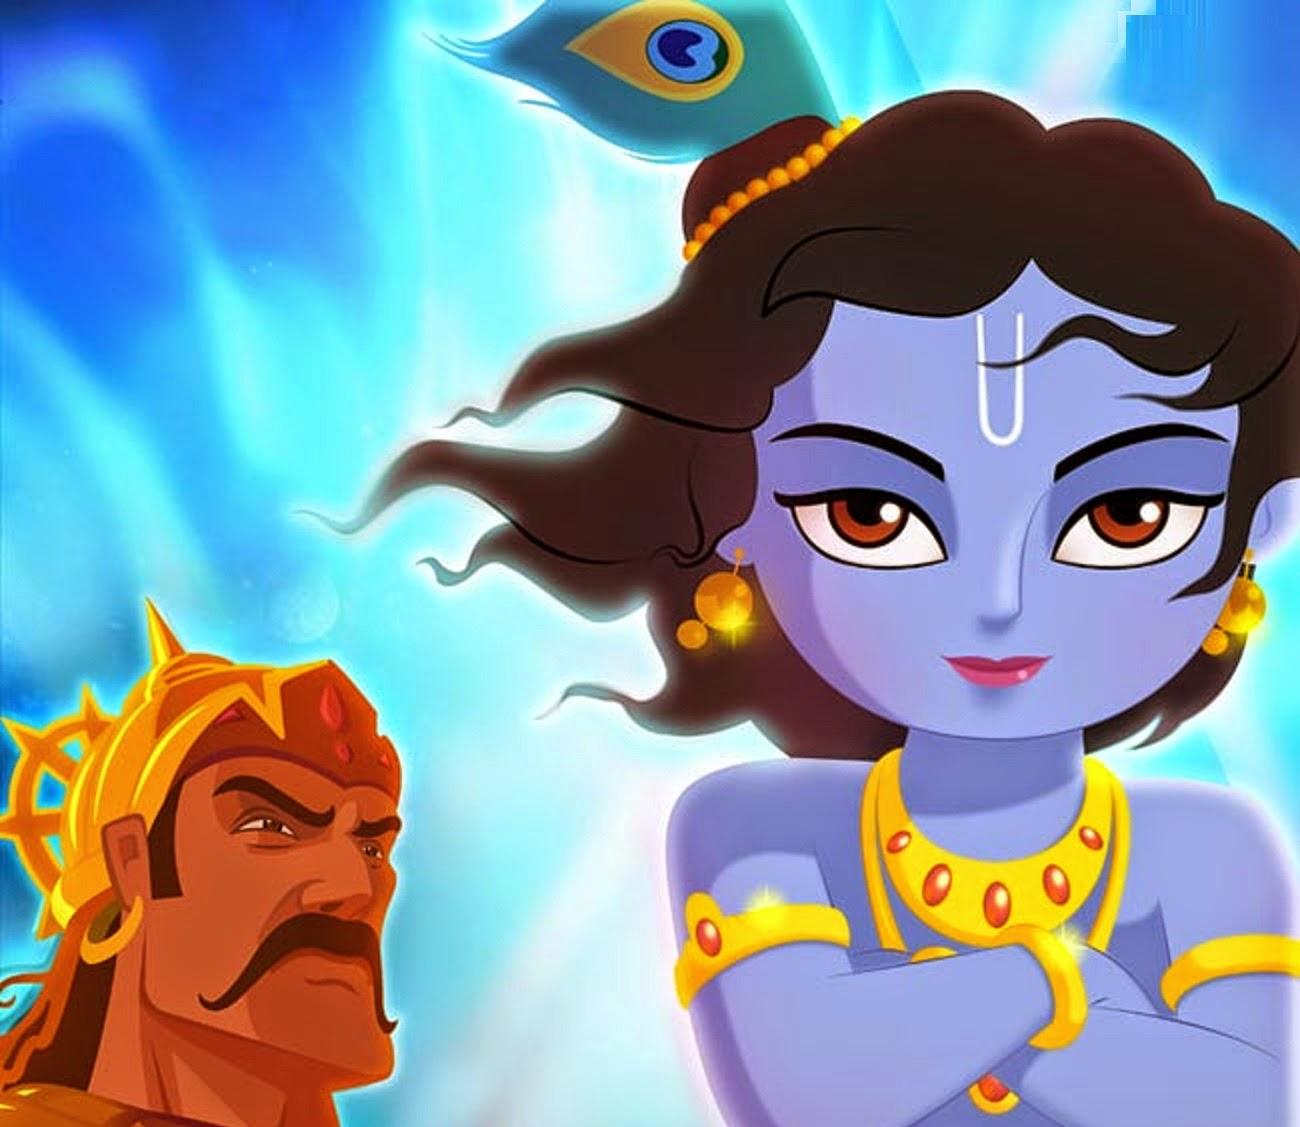 Little Krishna Wallpapers Free Download